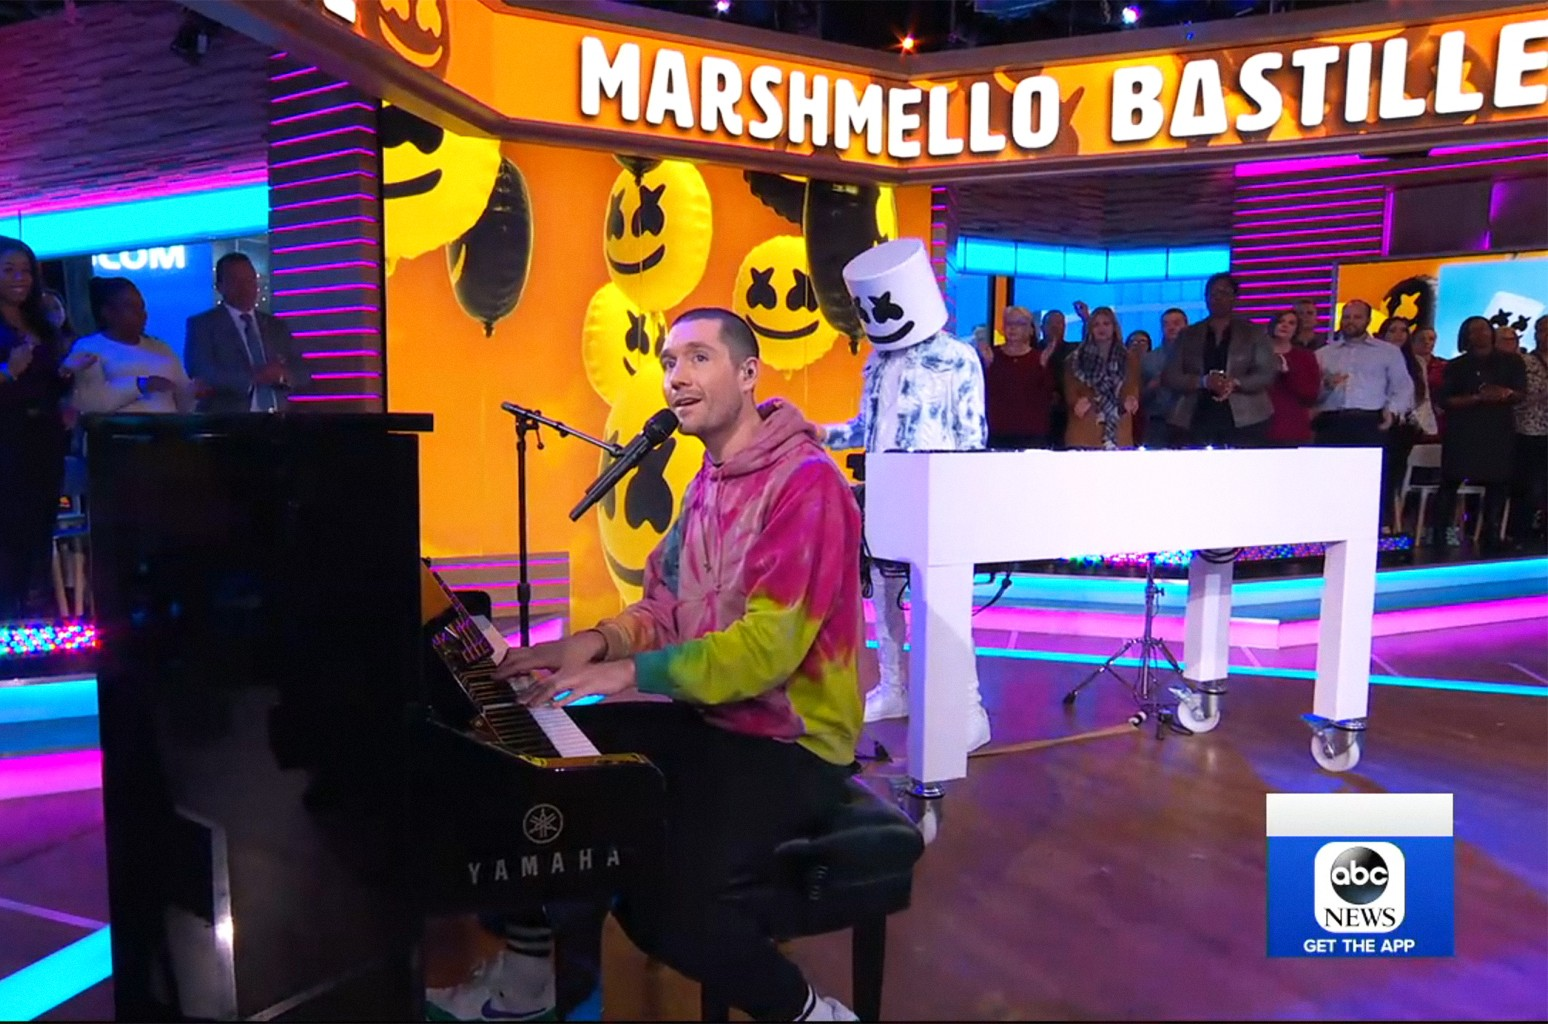 Marshmello and Bastille